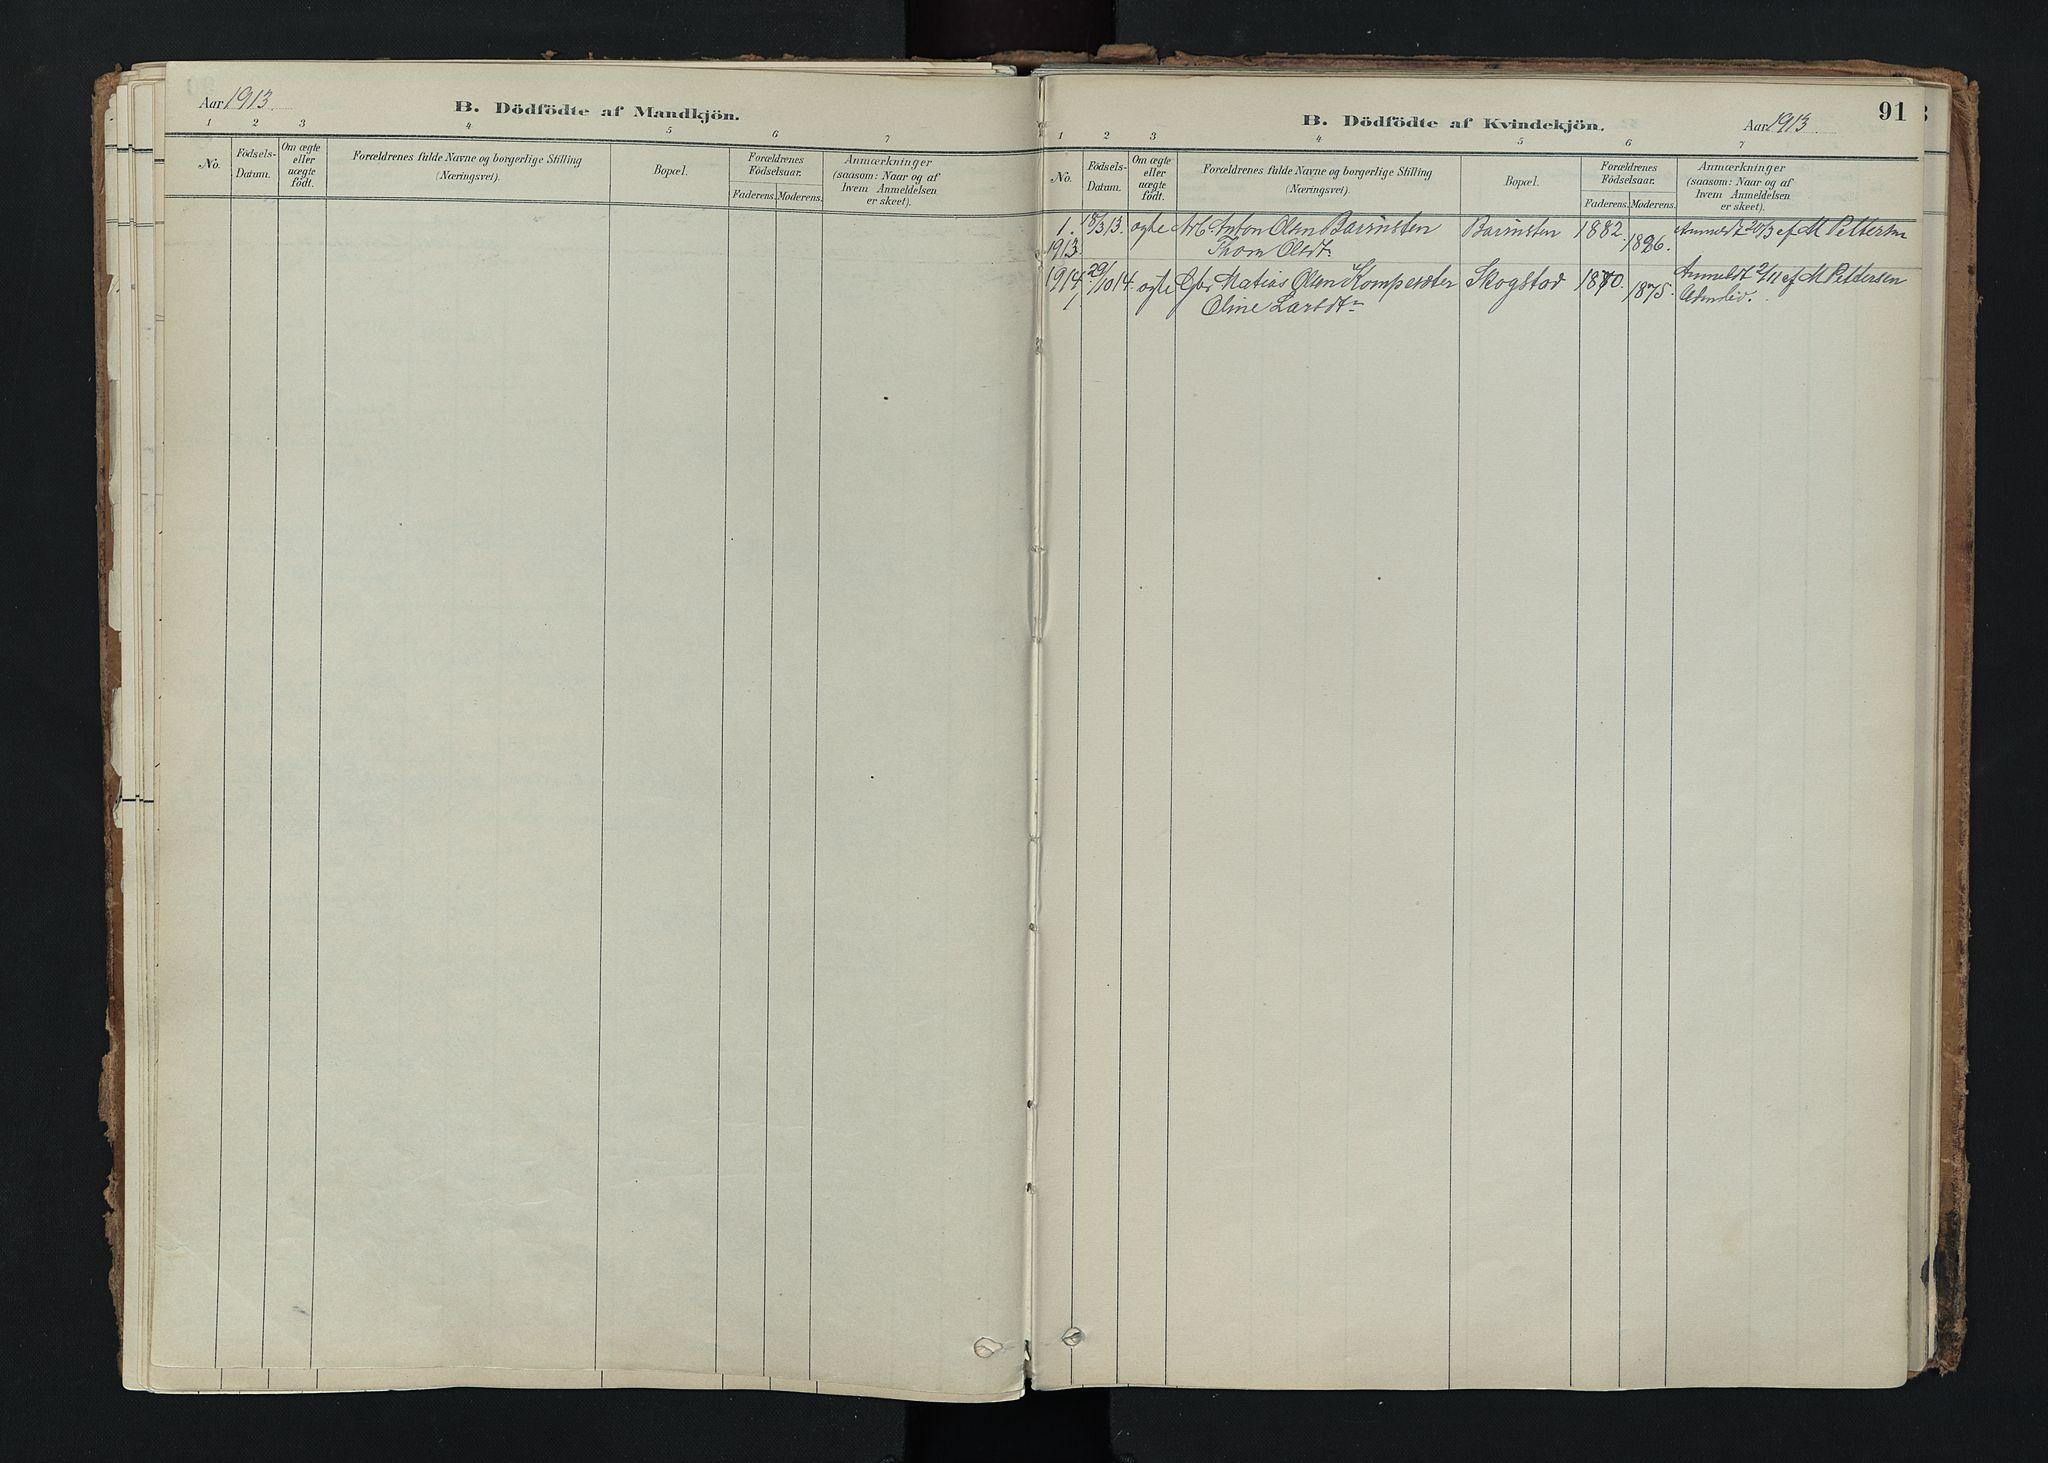 SAH, Nord-Fron prestekontor, Ministerialbok nr. 5, 1884-1914, s. 91